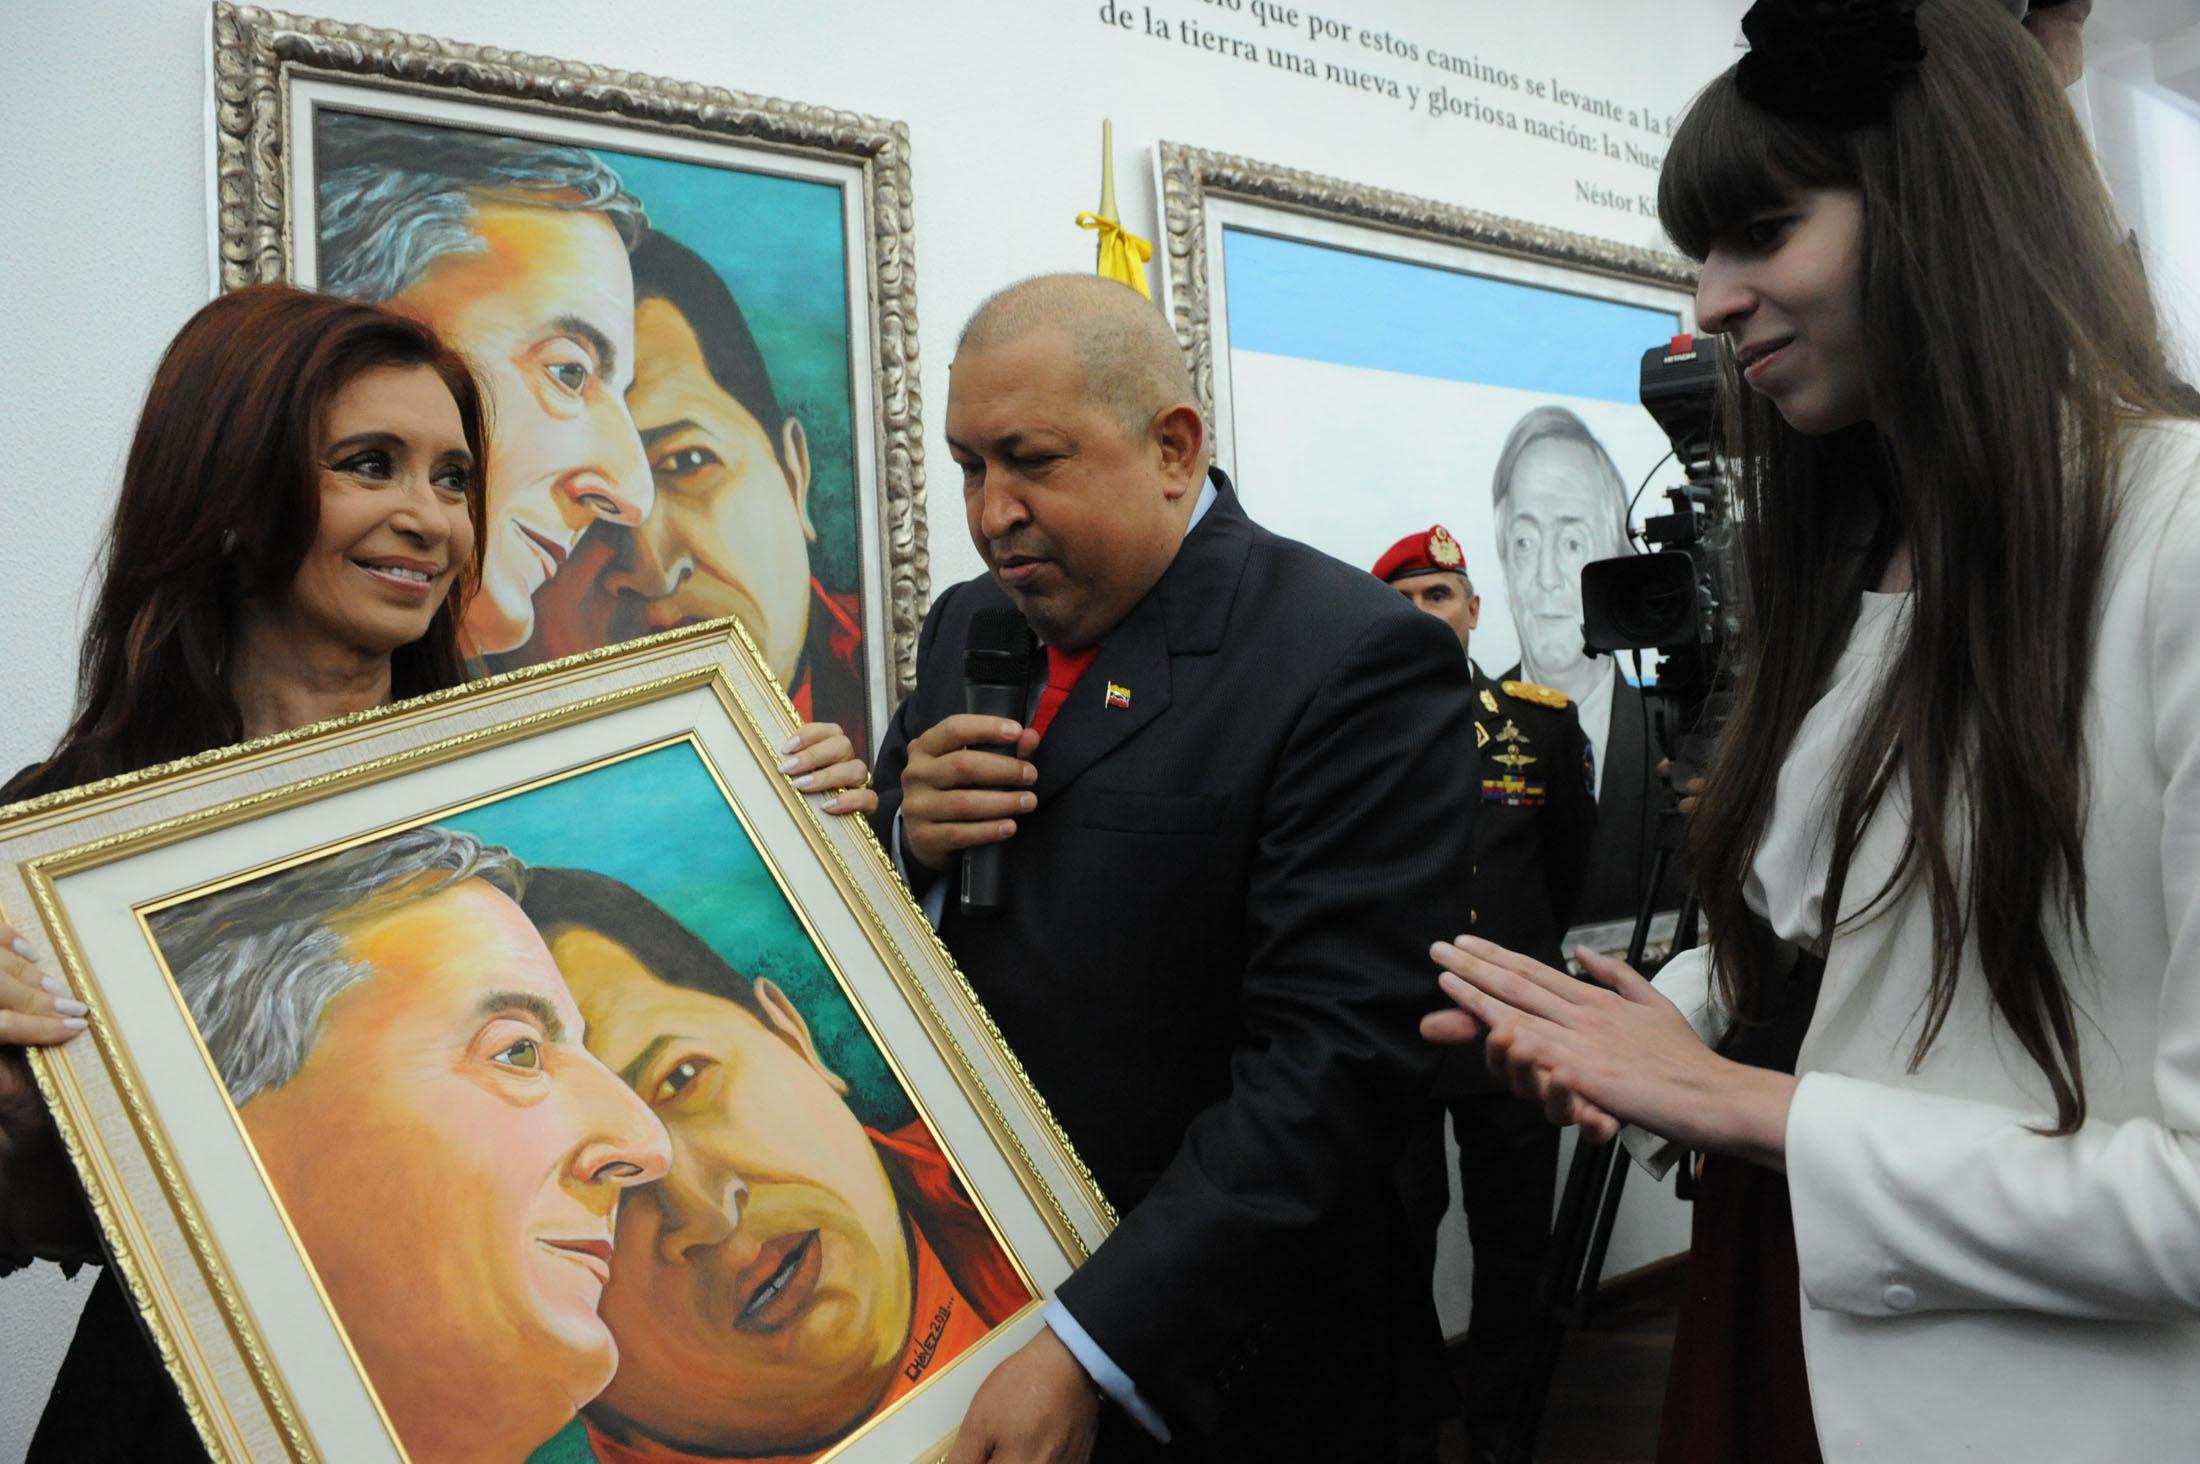 File:Cristina Fernández De Kirchner Y Hugo Chávez Salón